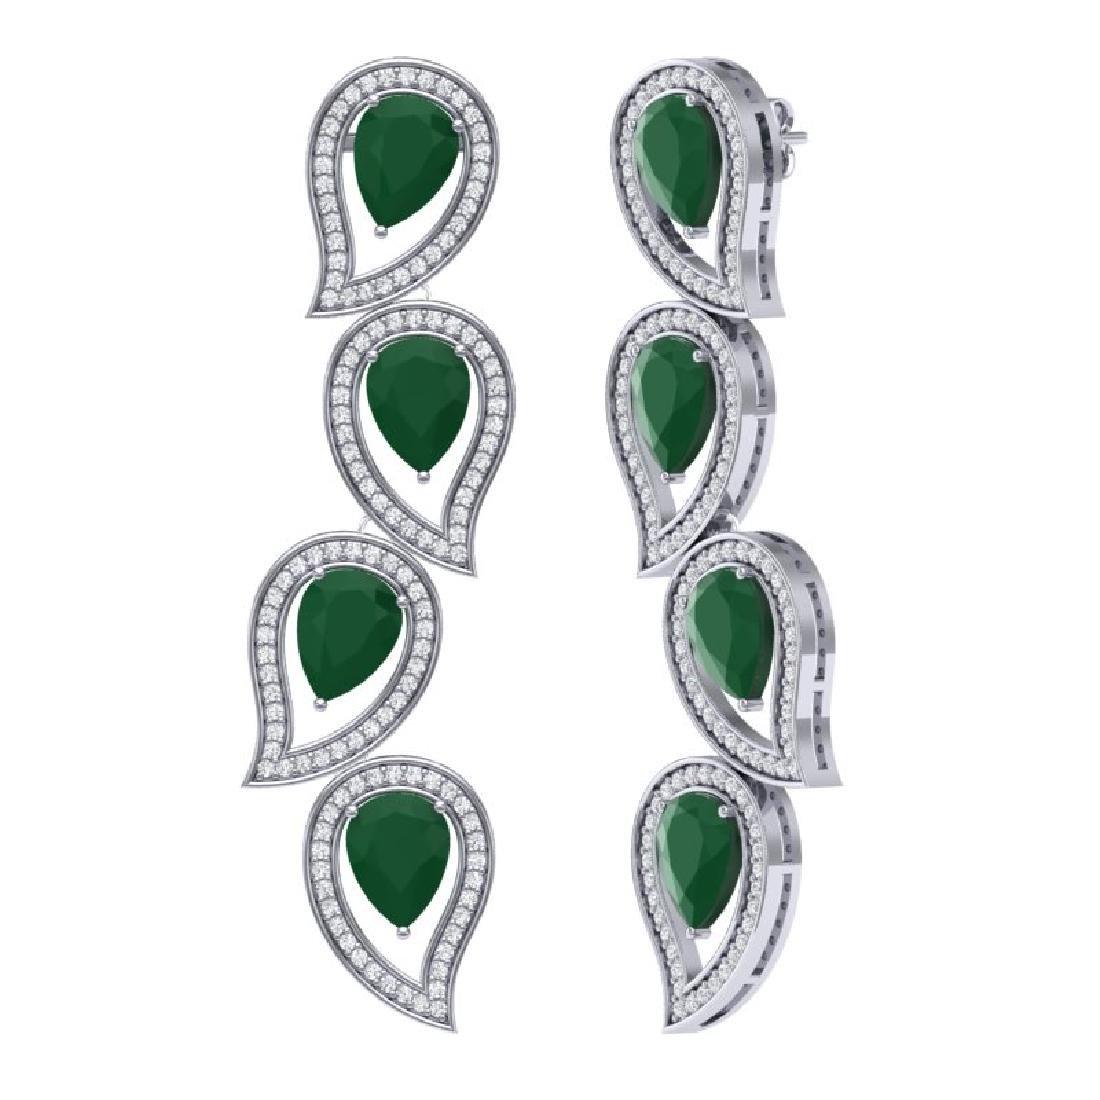 16.44 CTW Royalty Emerald & VS Diamond Earrings 18K - 3